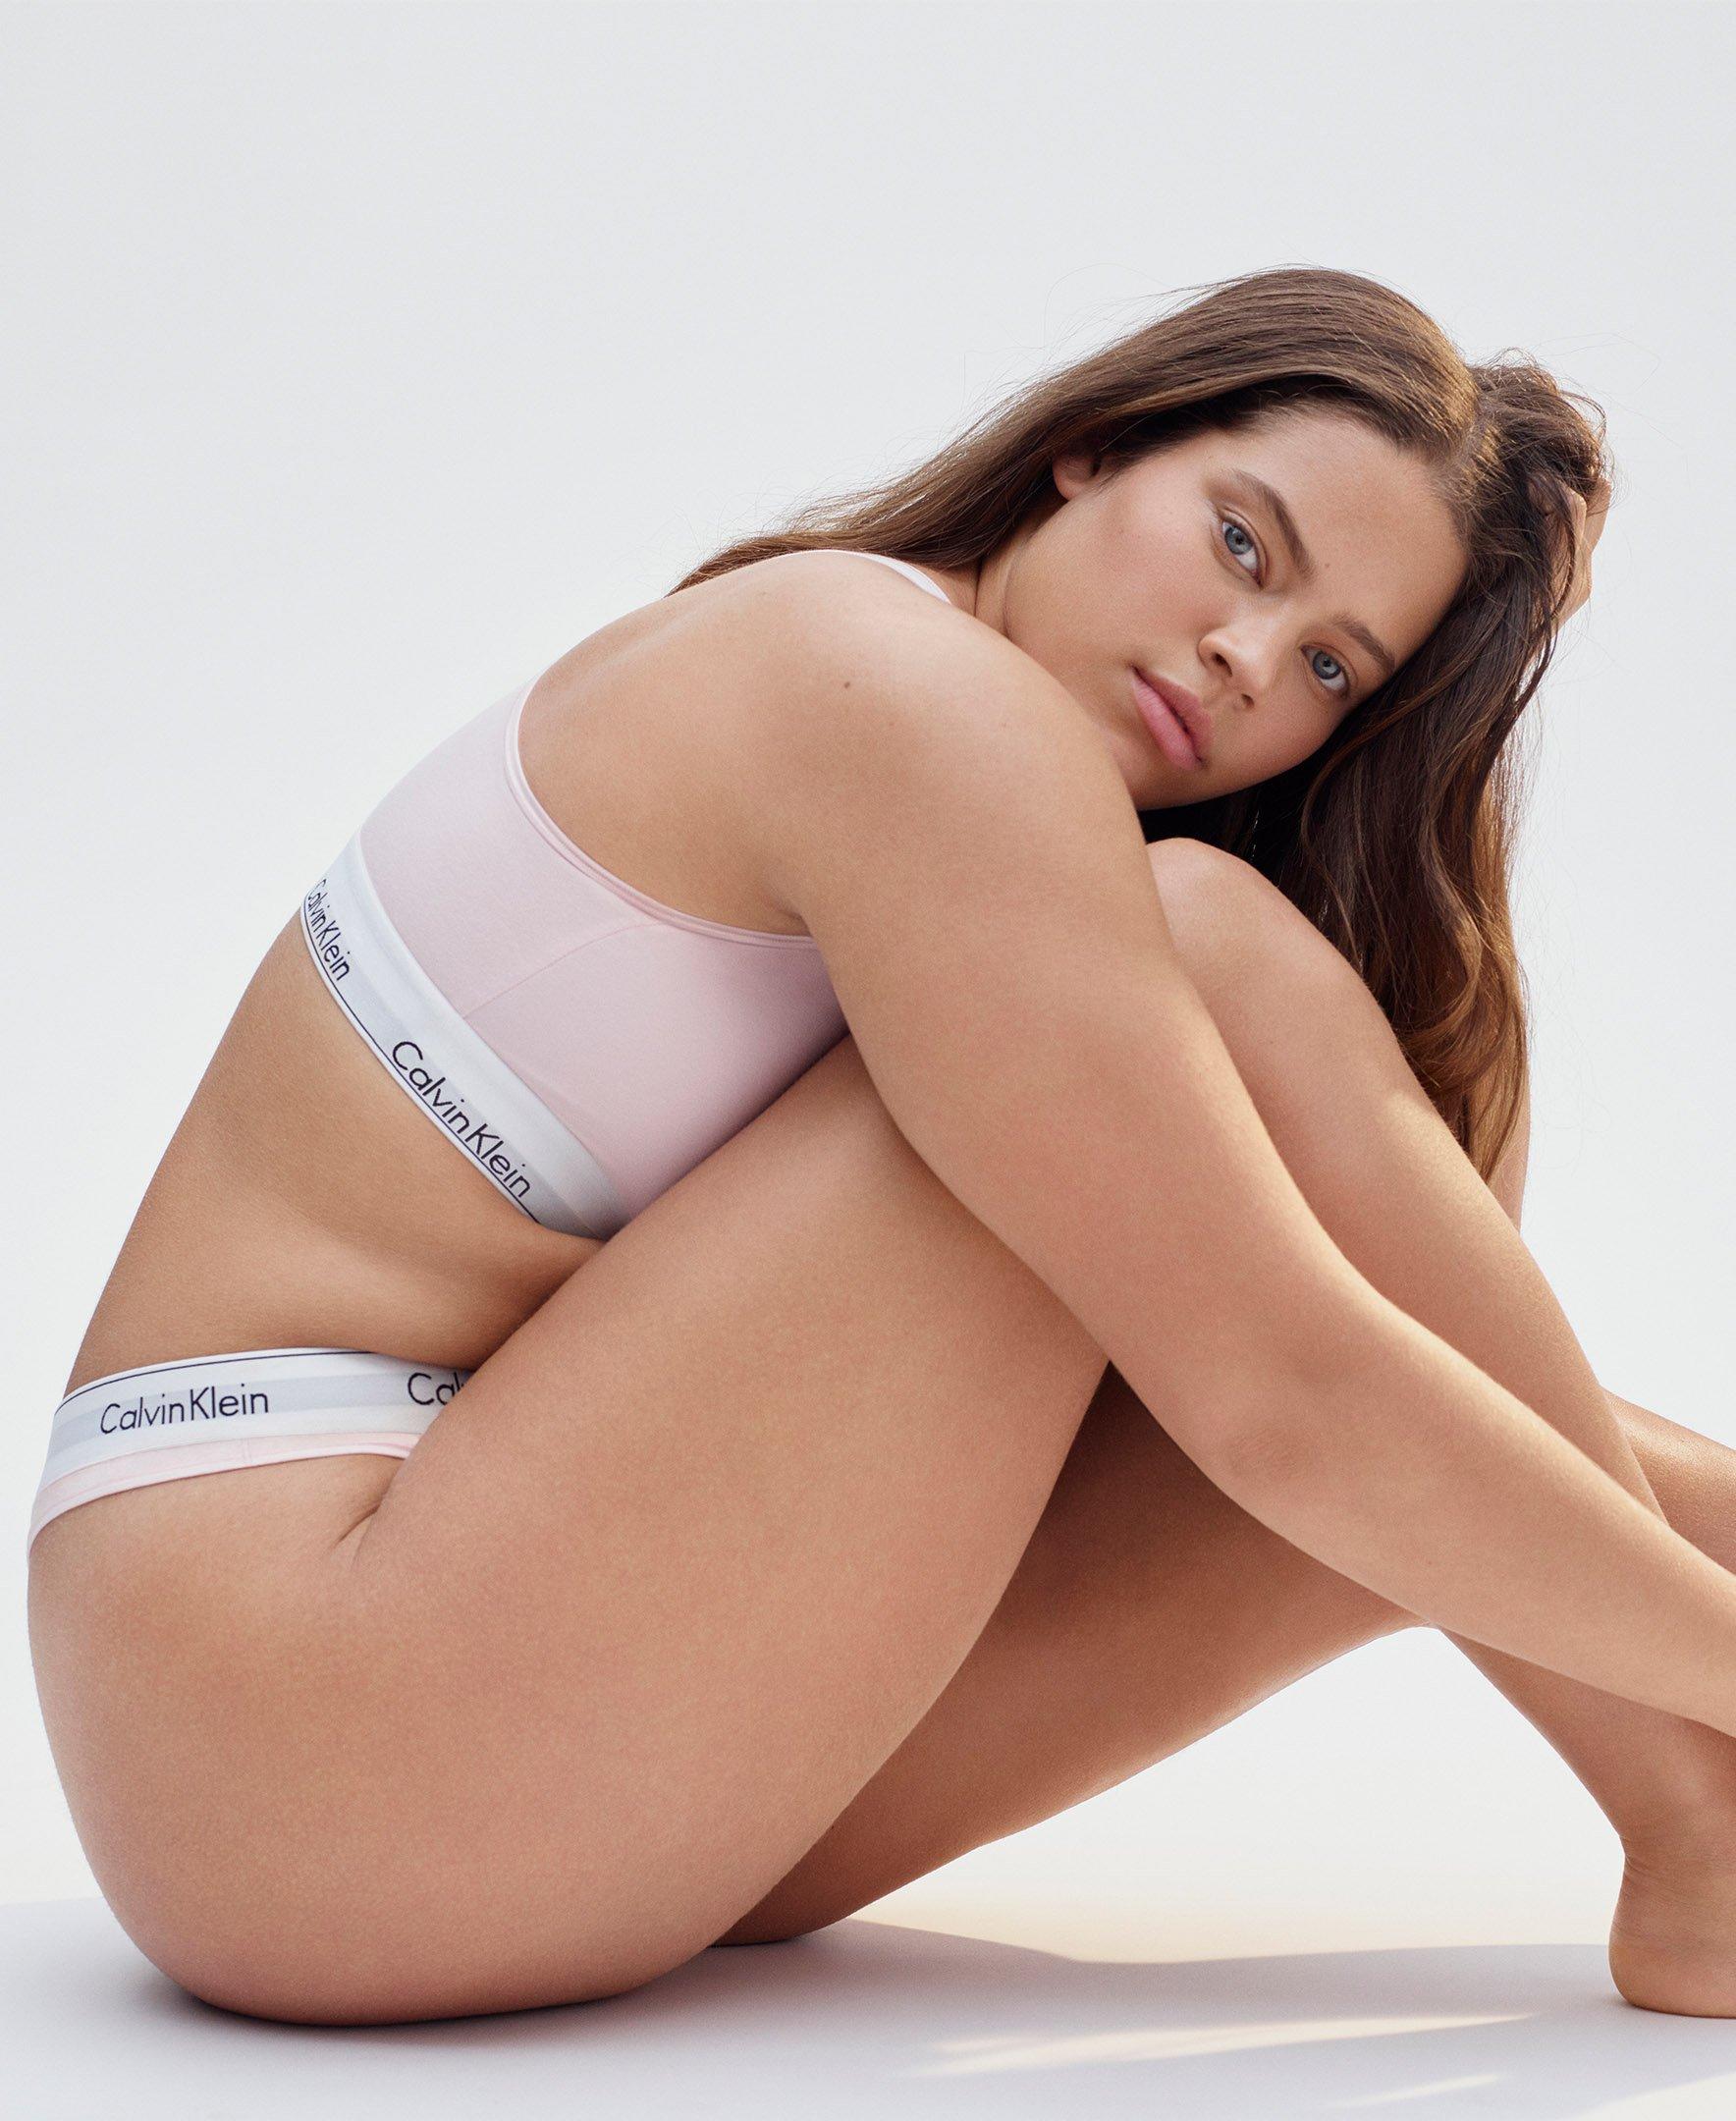 583e4a3c2ffde Galleon - Calvin Klein Women s Plus Size Modern Cotton Thong Panty ...